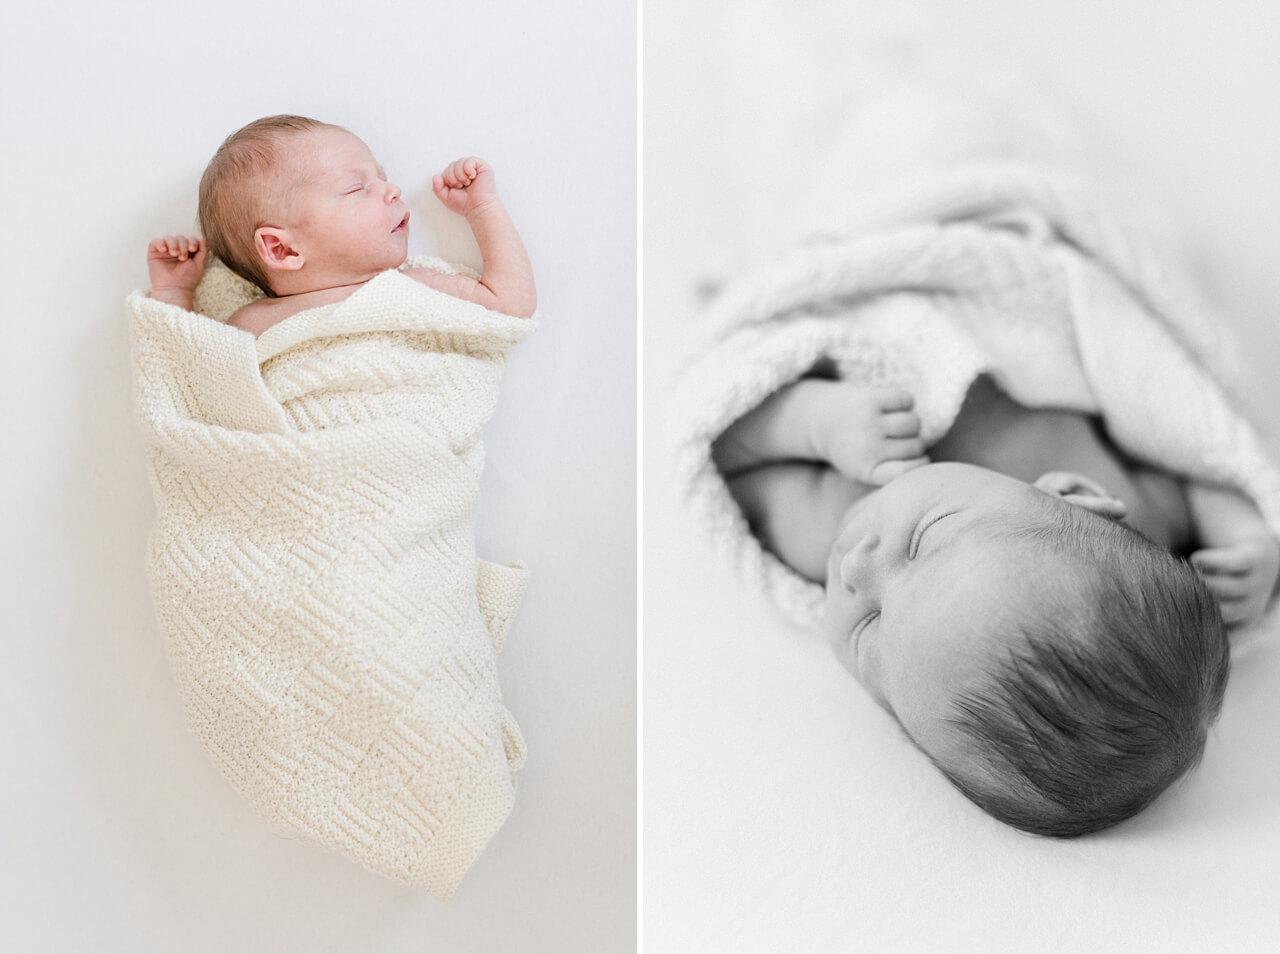 Rebecca Conte Fotografie: Wundervolles Newbornshooting 04